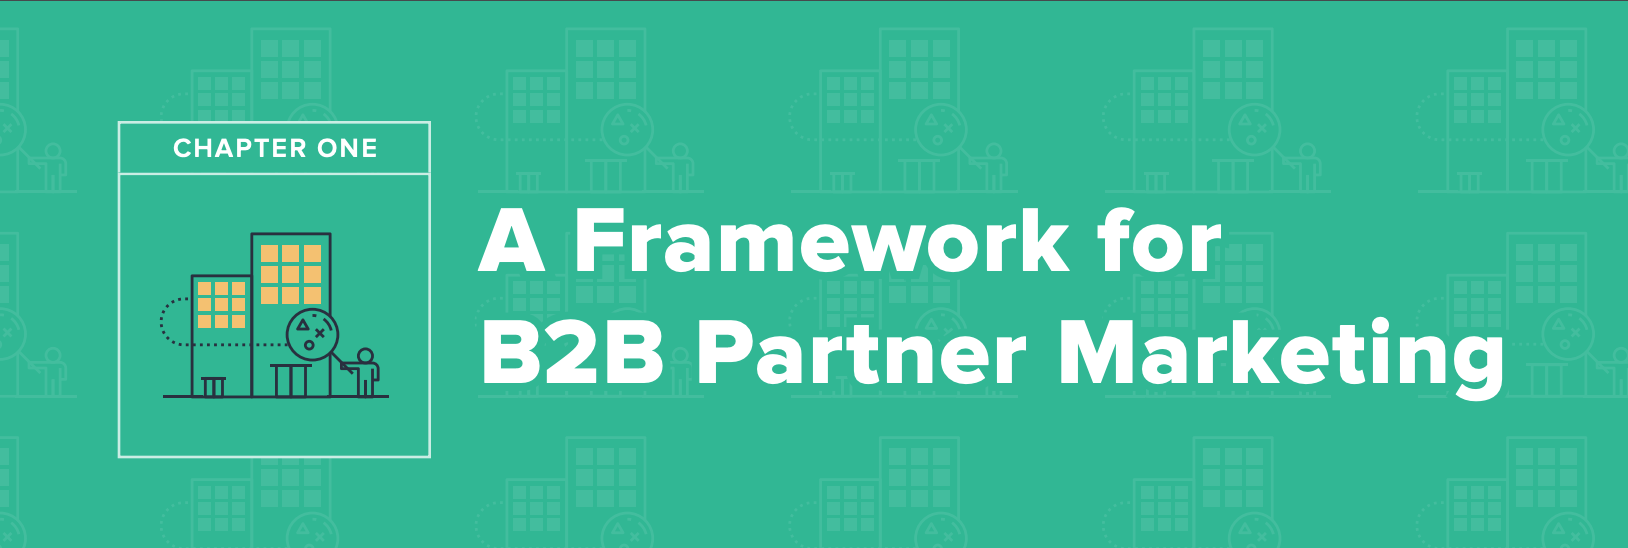 A framework for B2B Partner Marketing